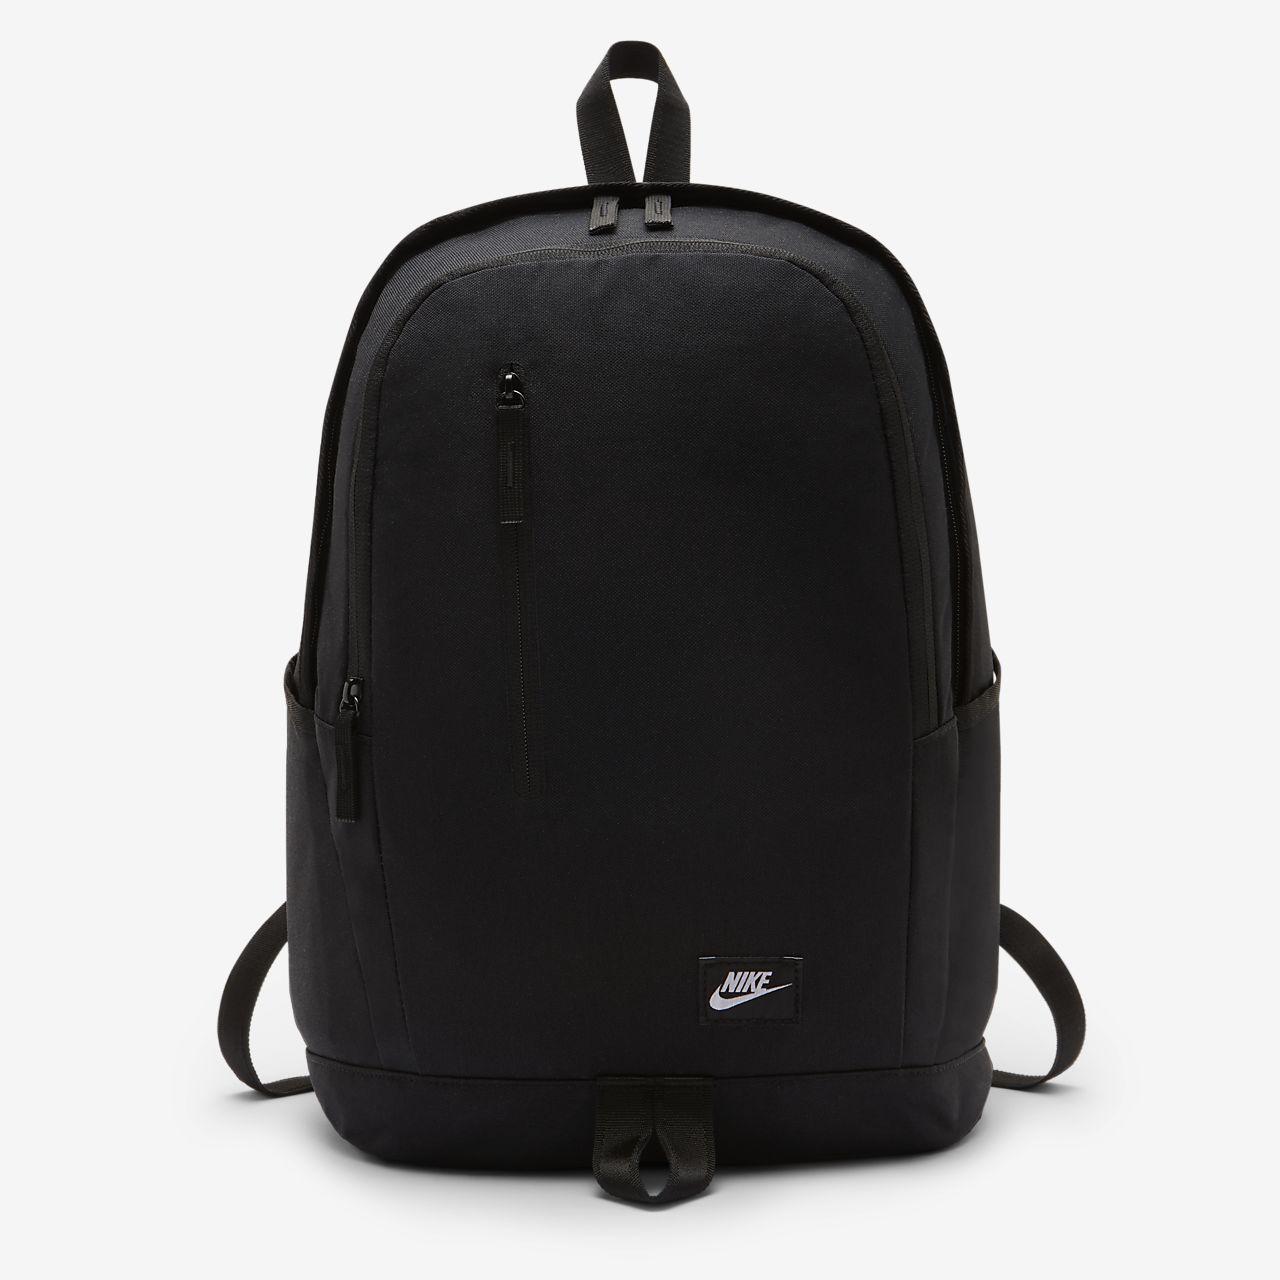 Nike All Access Soleday ryggsekk